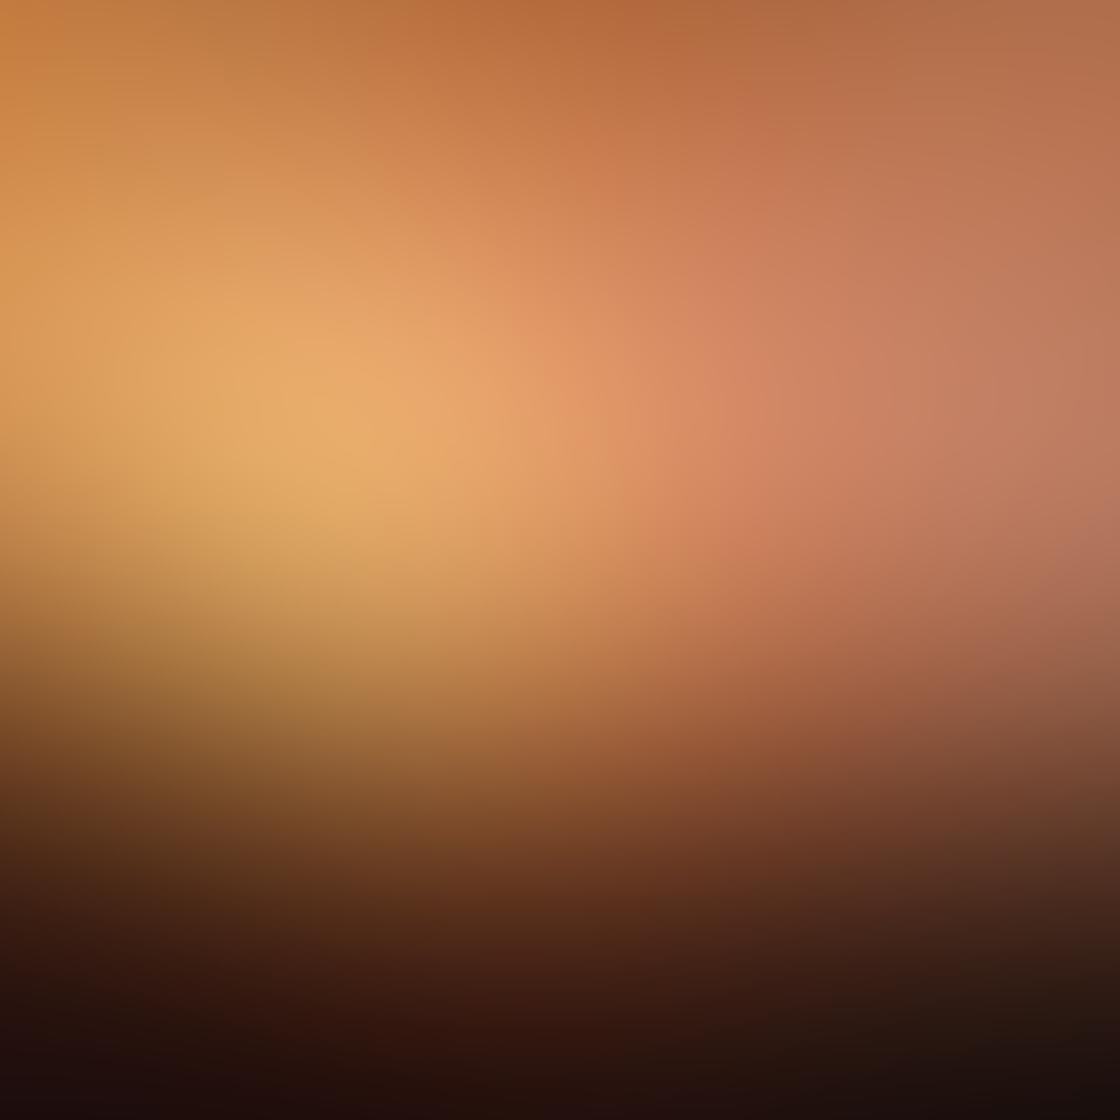 iPhone Angle Photo 25